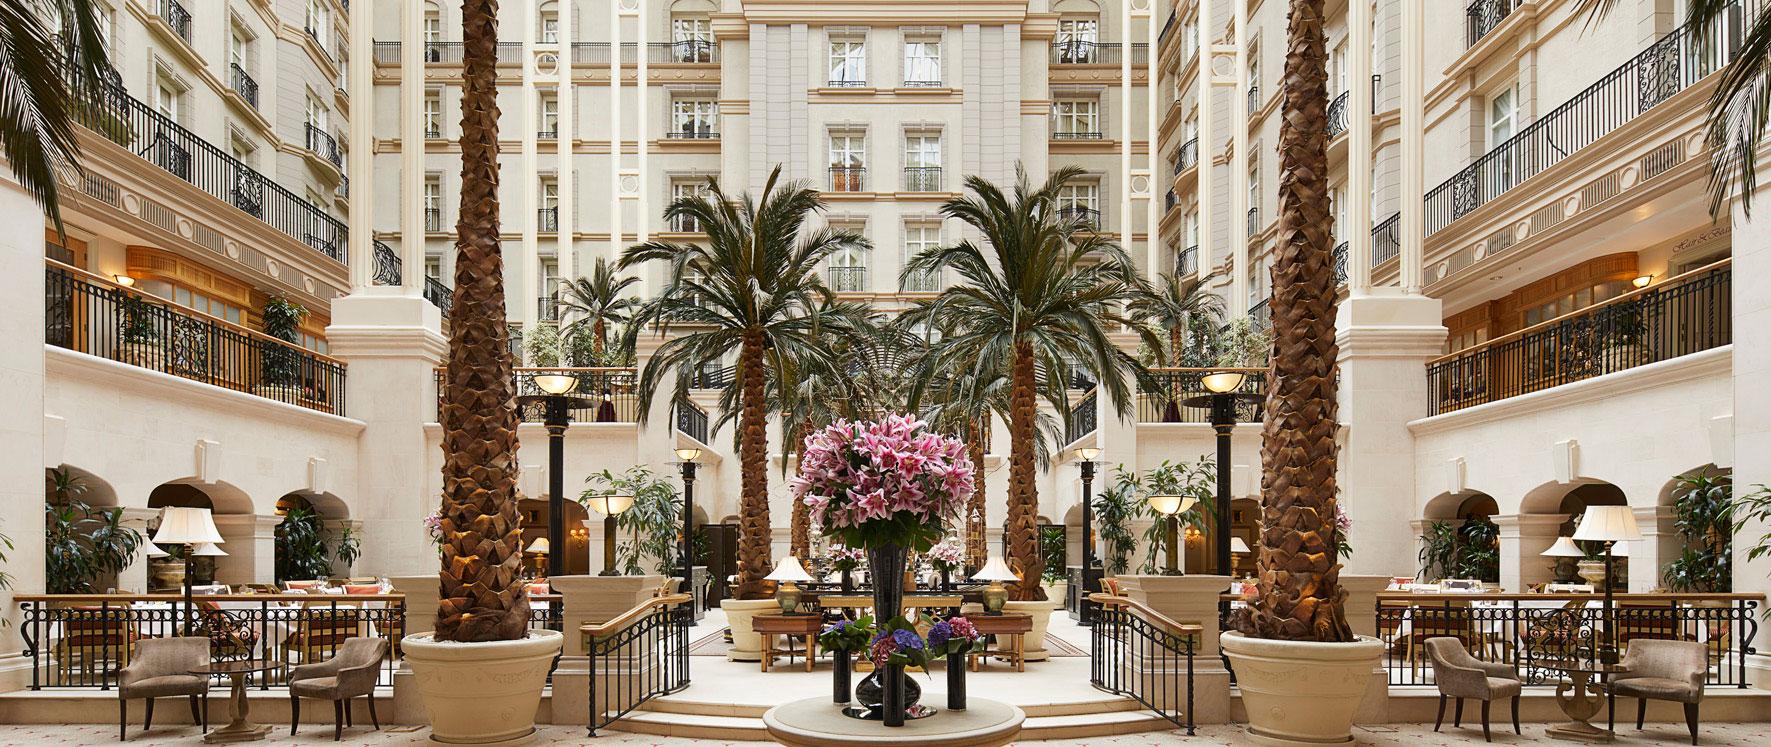 Landmark Hotel Move  London - Hotel Interior Logistics